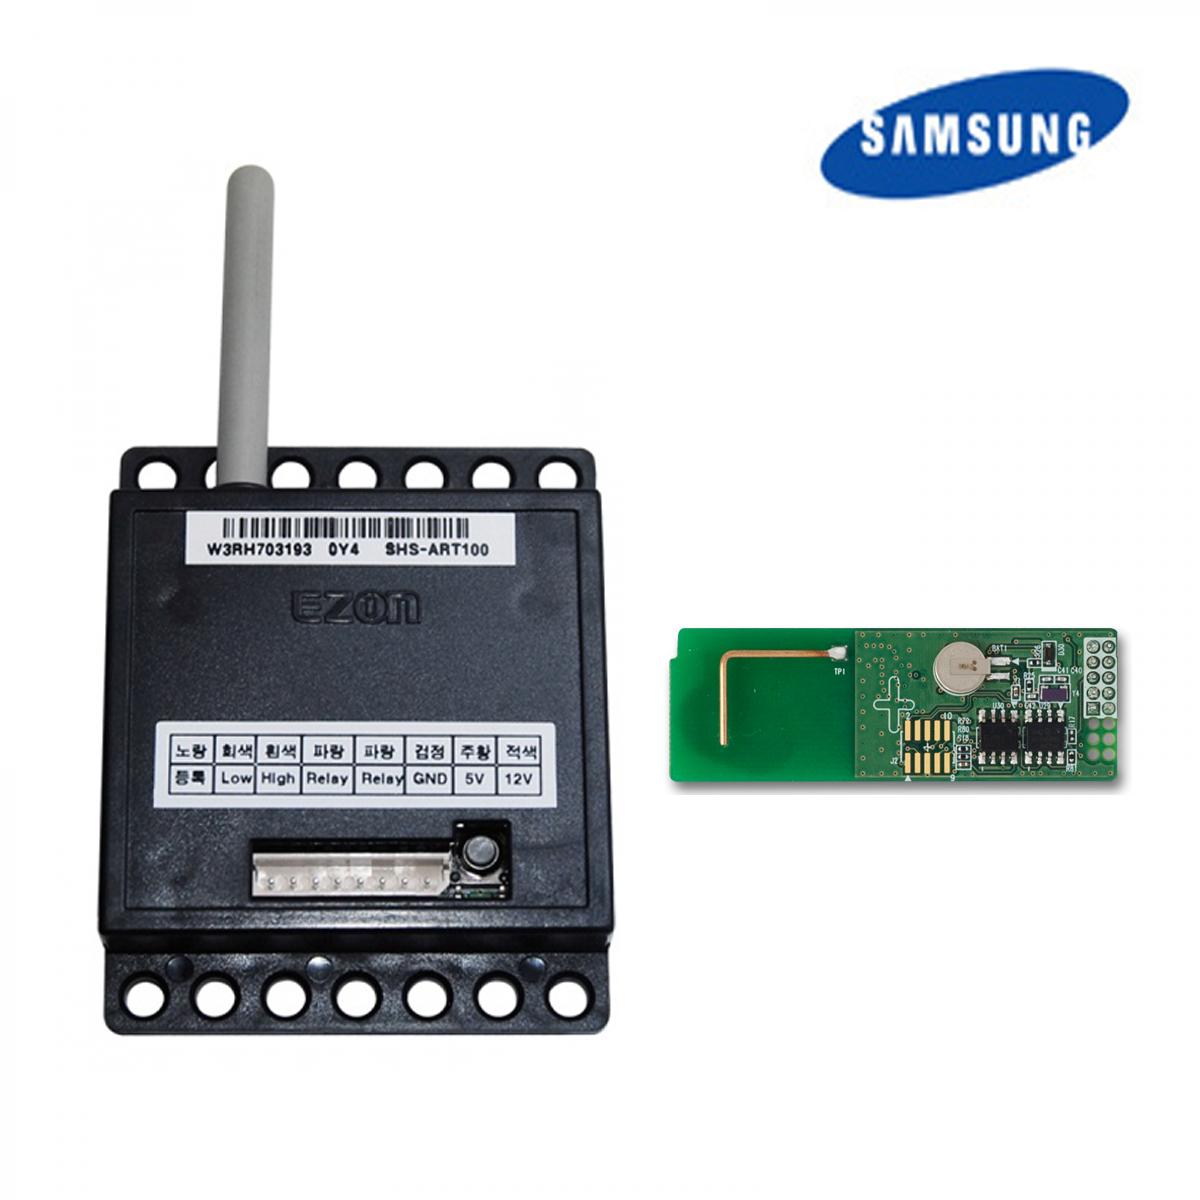 Phụ kiện kết nối Smarthome Samsung